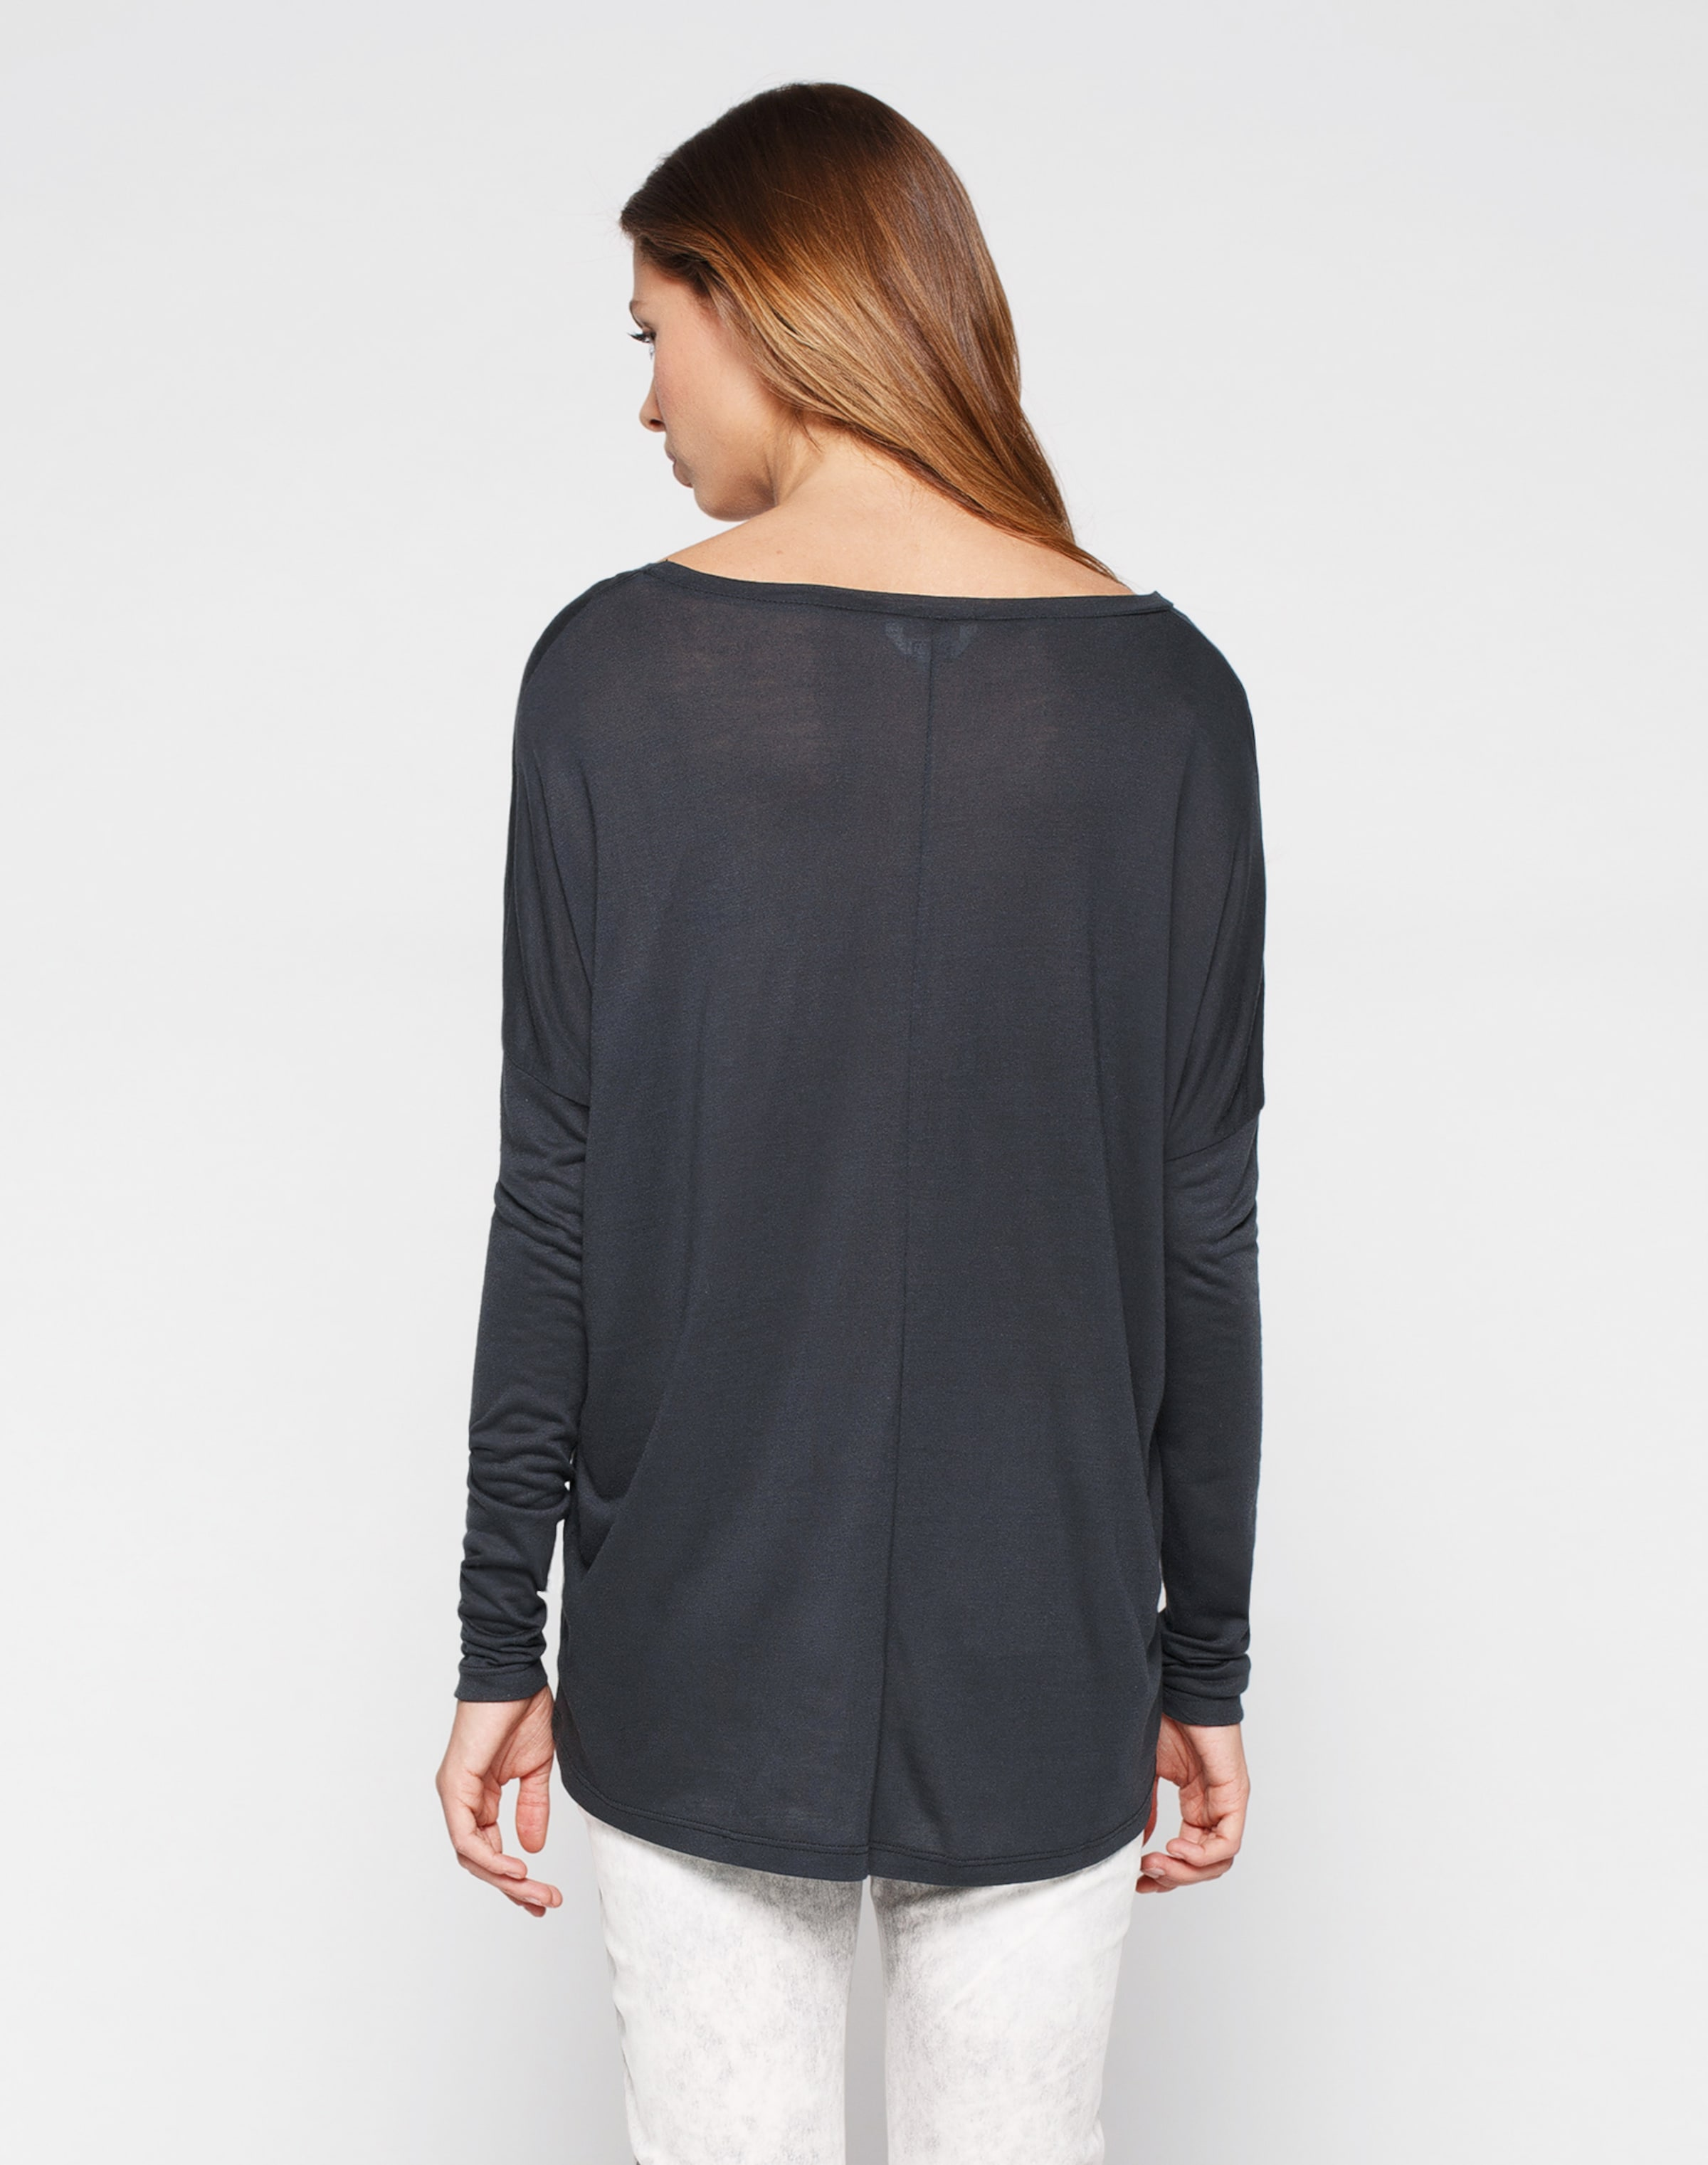 Gris Oversize Foncé T shirt Mbym En cRL3j54Aq